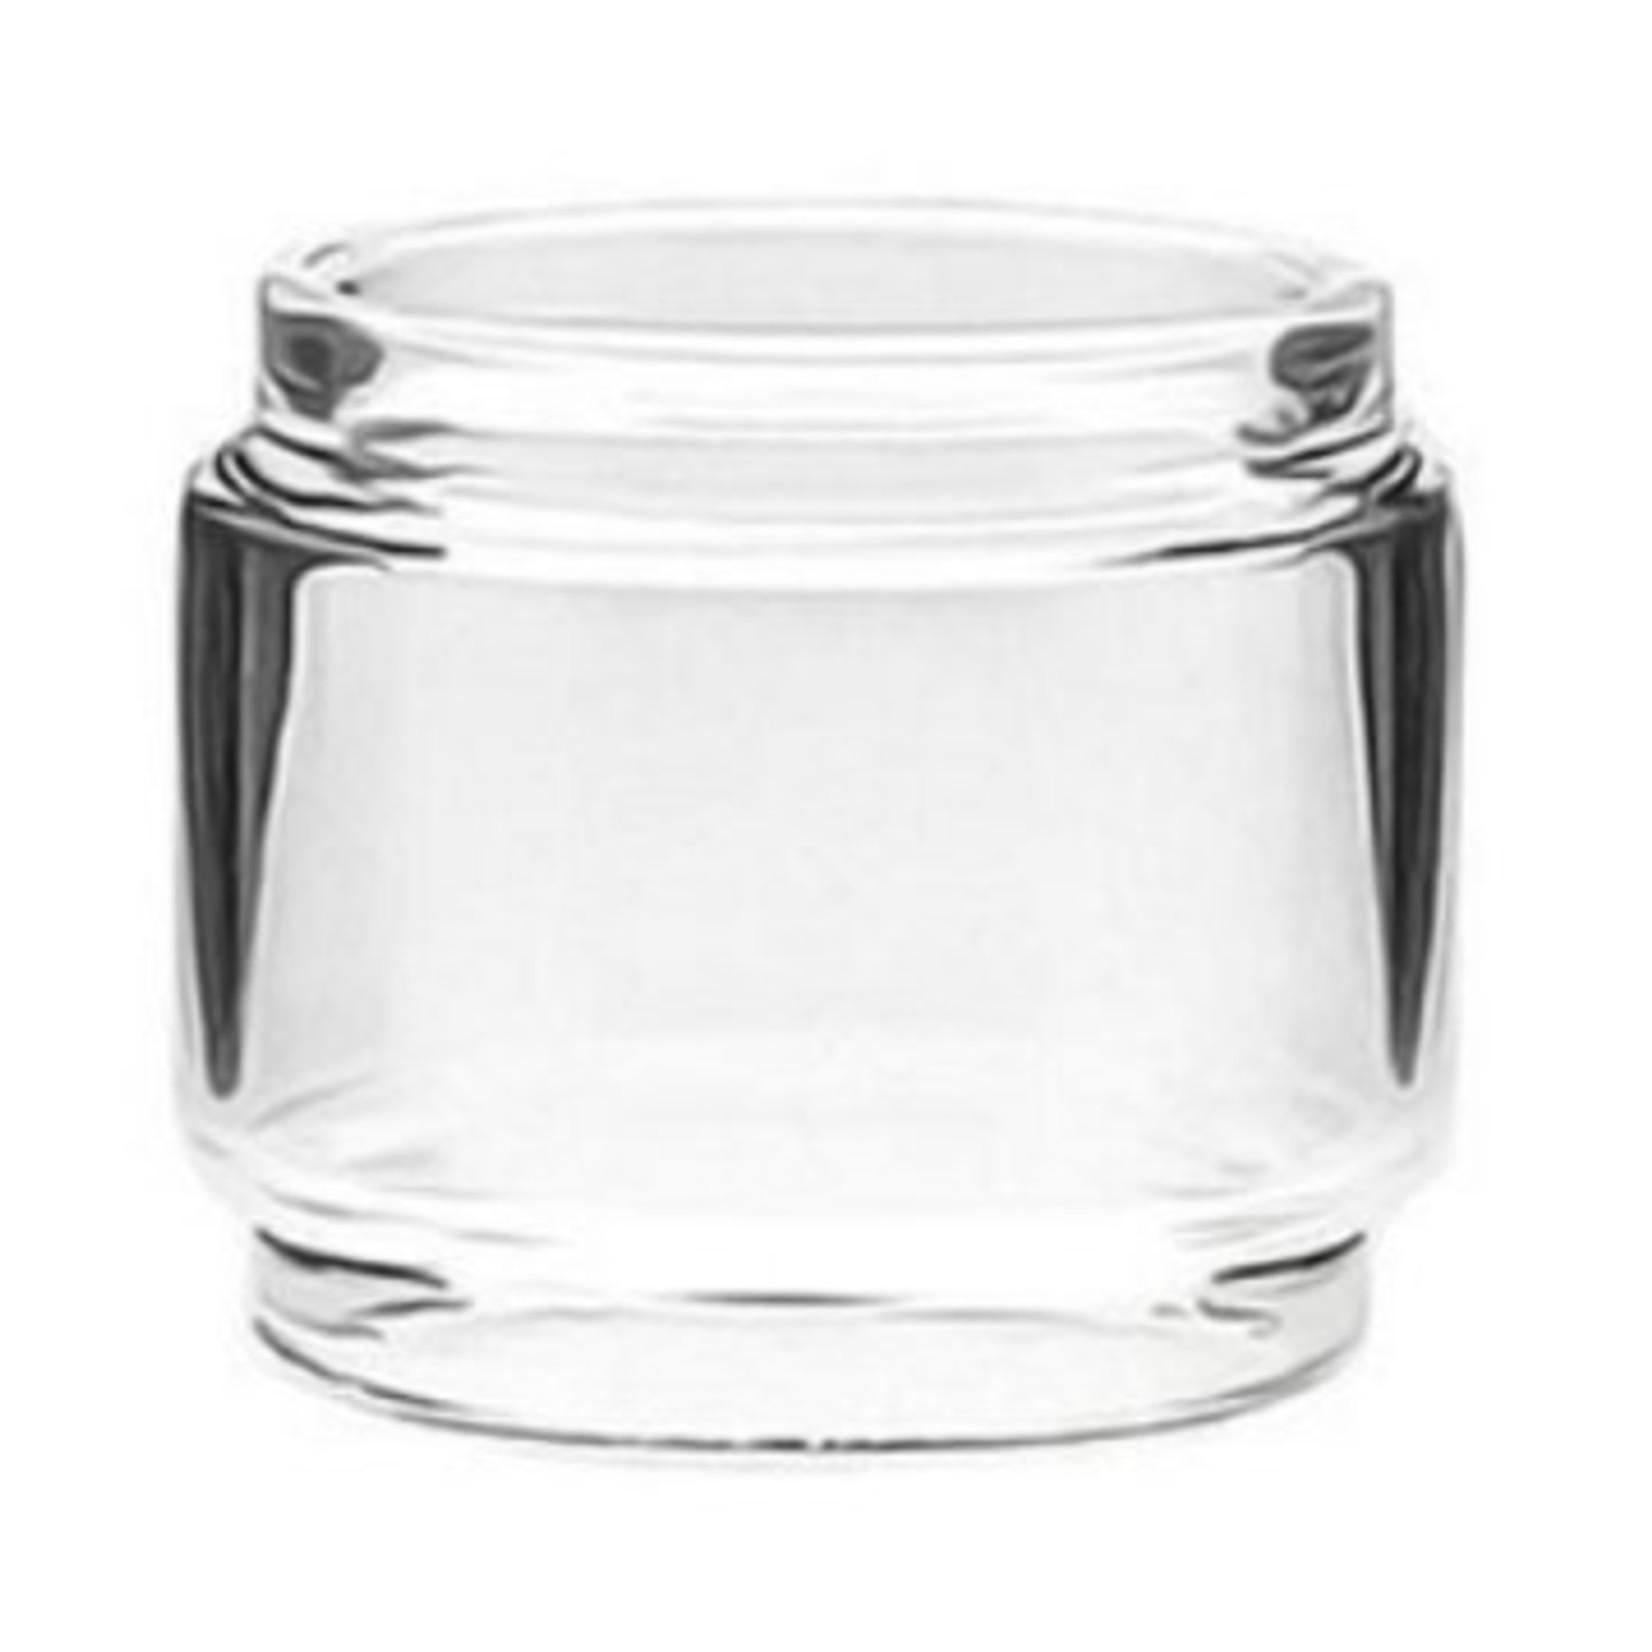 Smok Baby Prince 4.5ml Replacement Glass